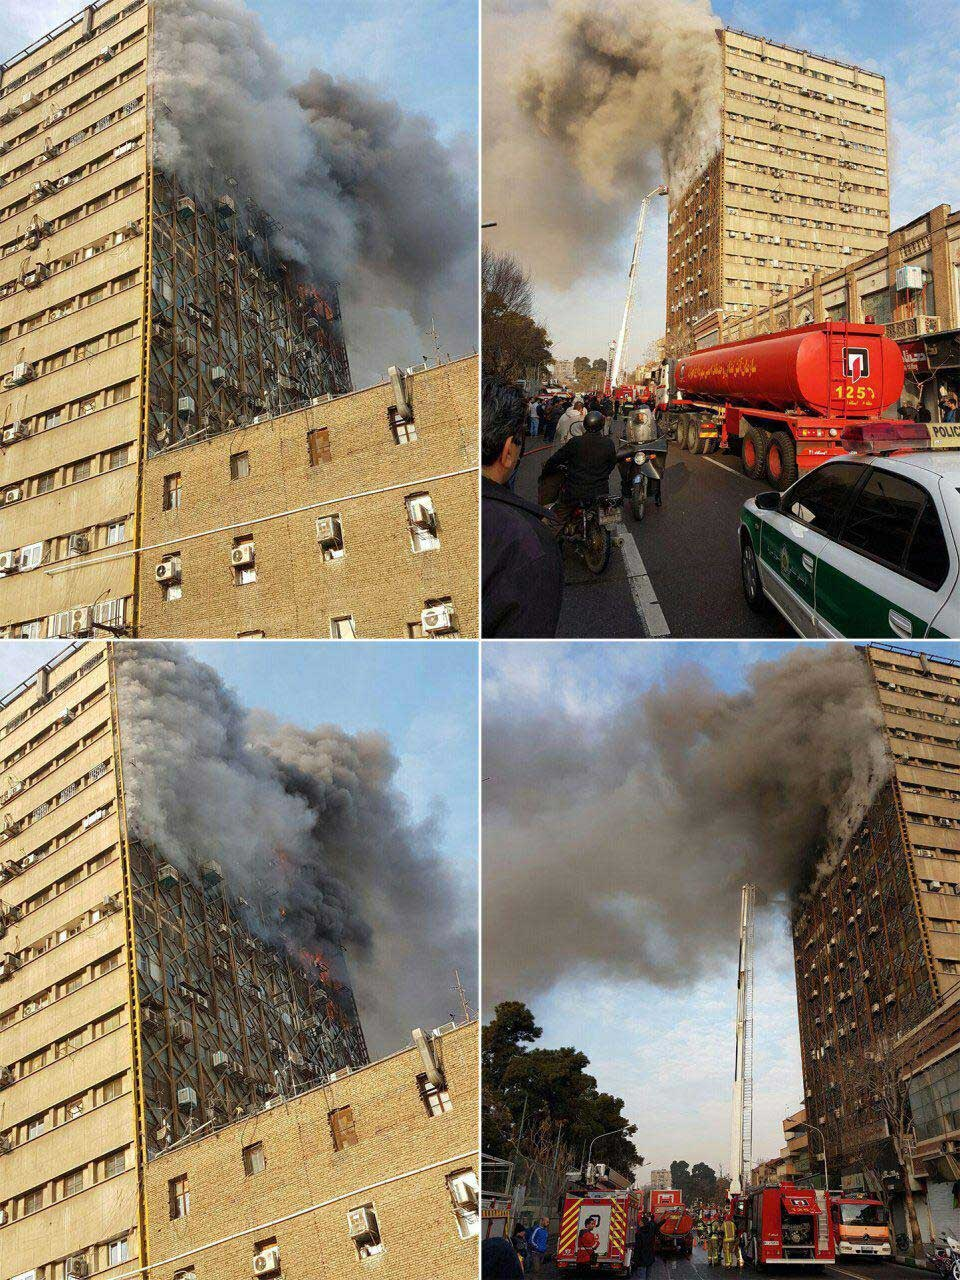 17 1 19 85543photo 2017 01 19 08 58 05 - تصاویر | آتشسوزی گسترده در ساختمان پلاسکو در تهران